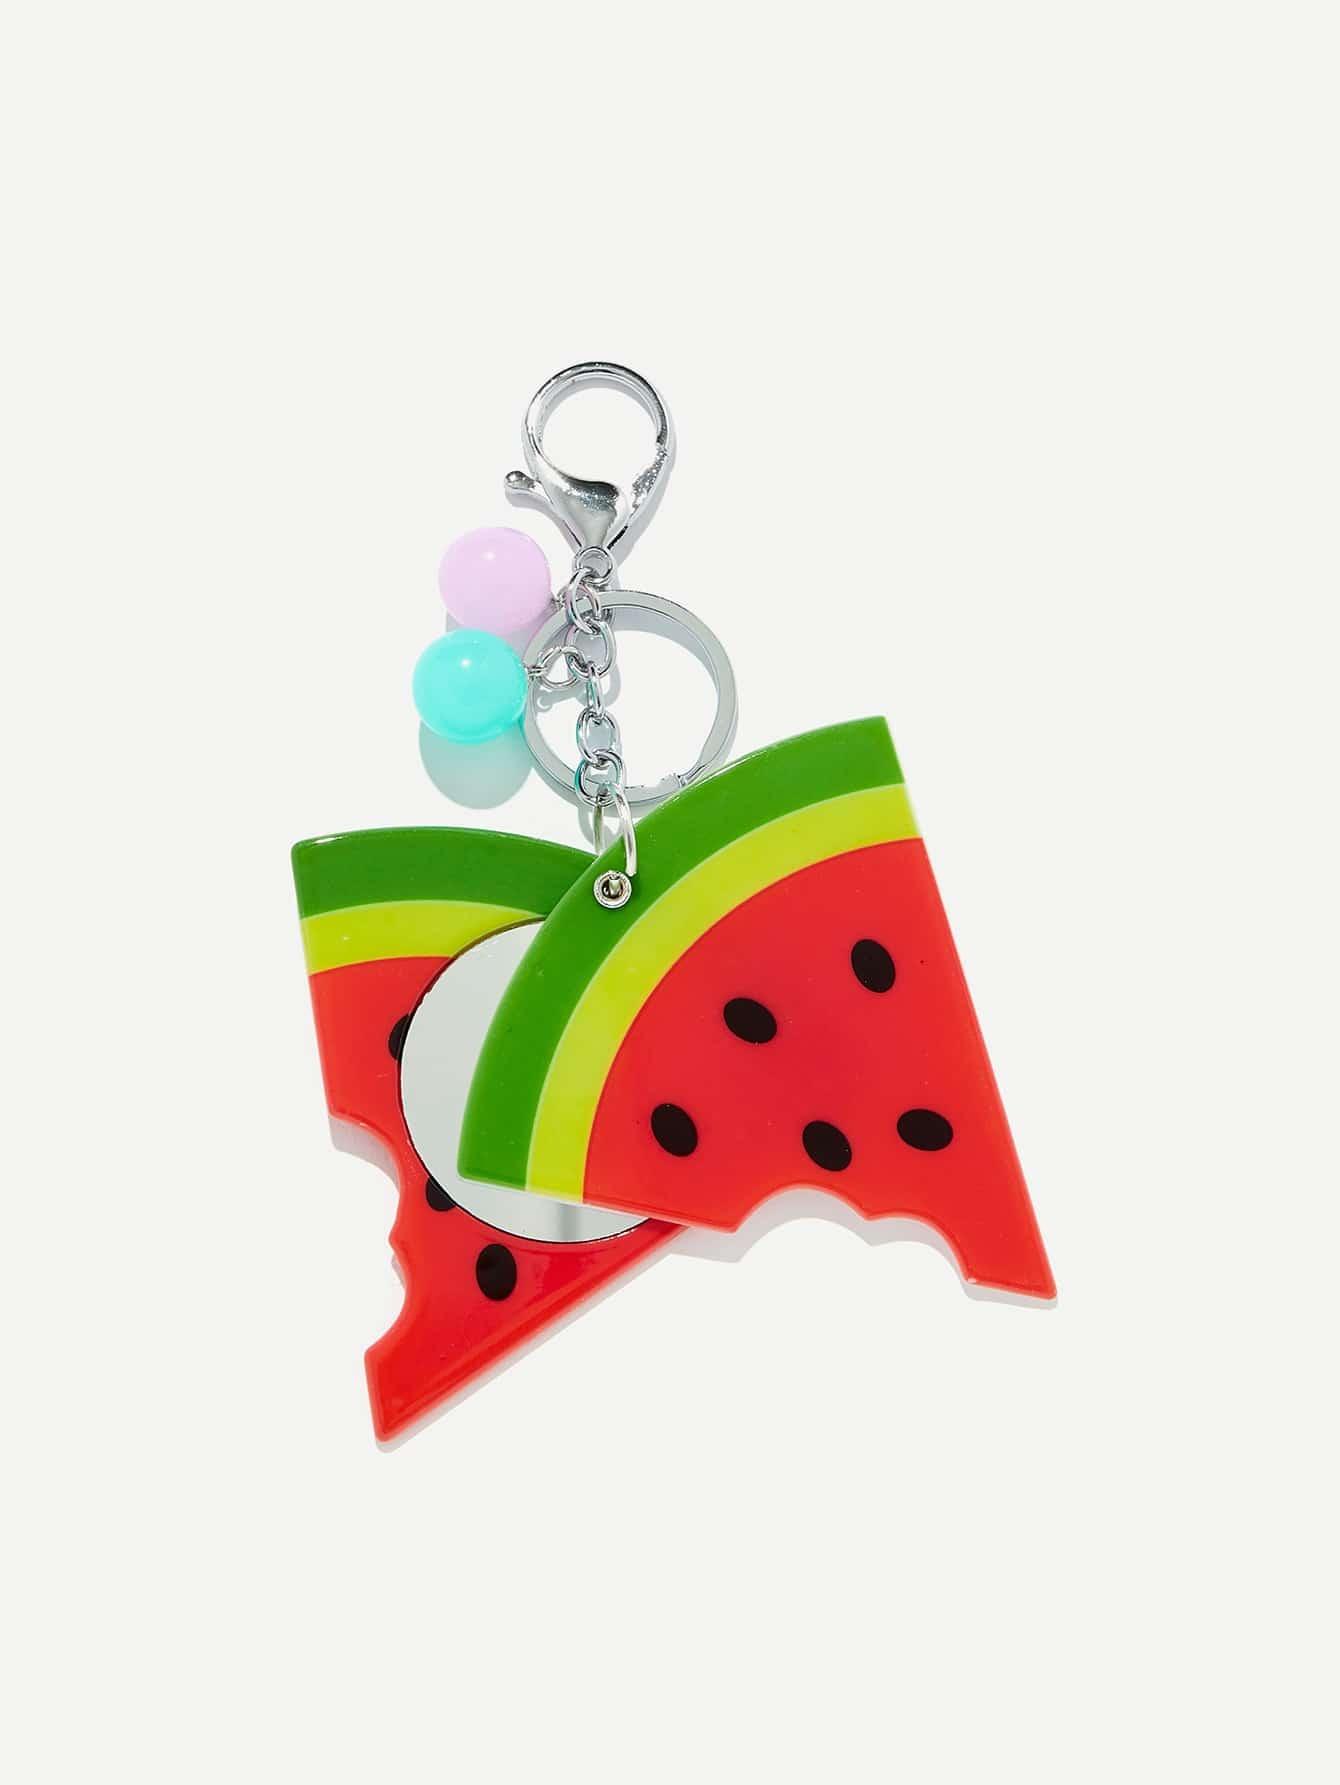 Random Color Ball Watermelon Shaped Keychain